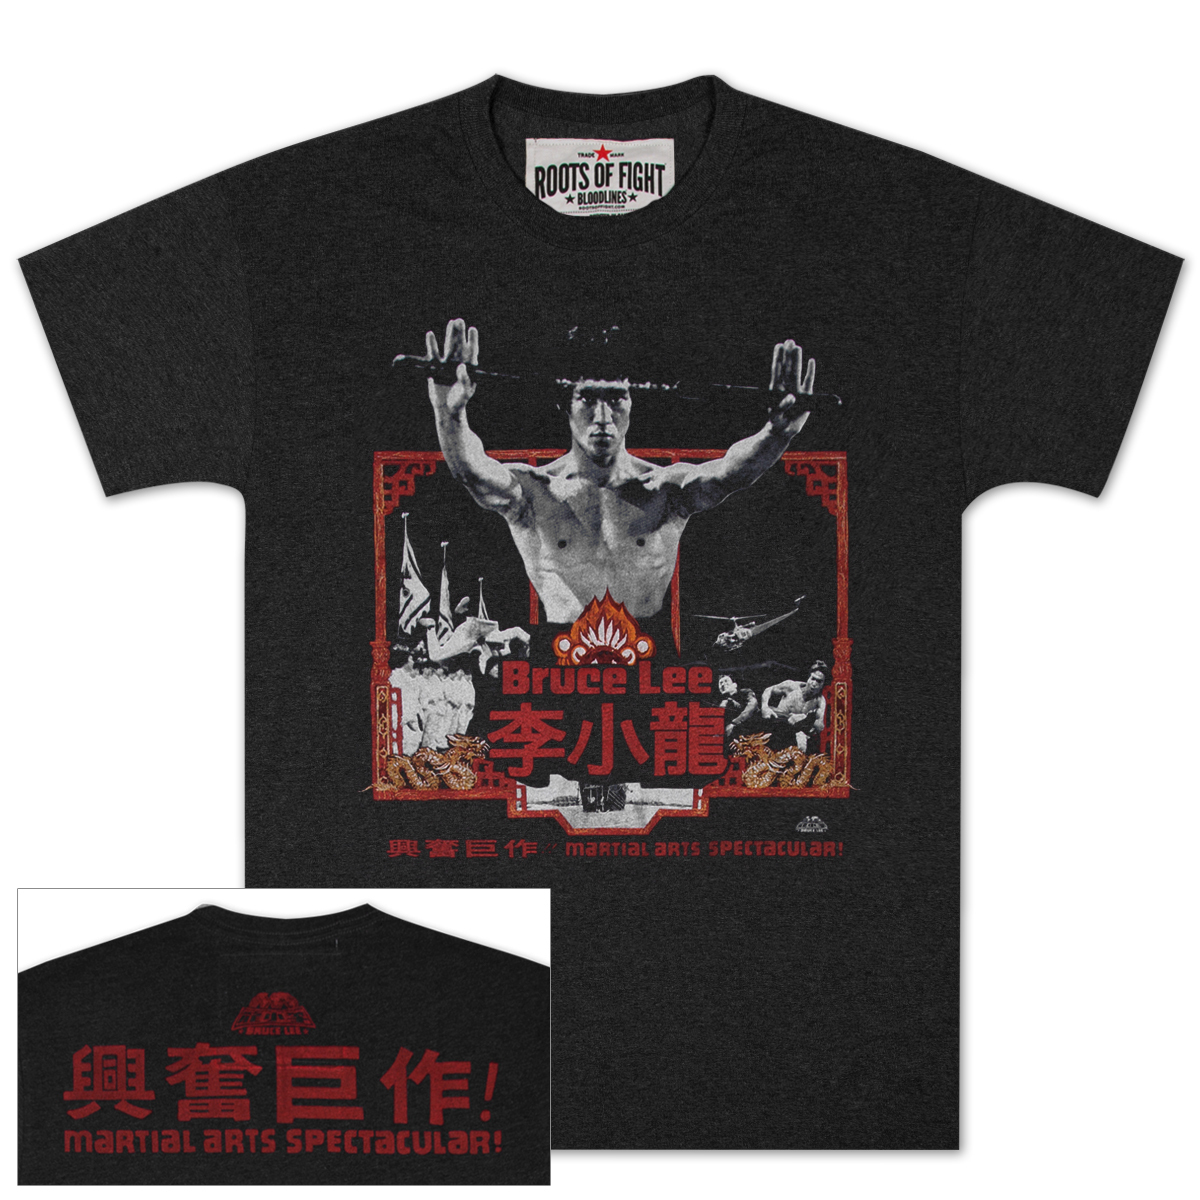 Bruce Lee Anniversary T-shirt Black SS/LG